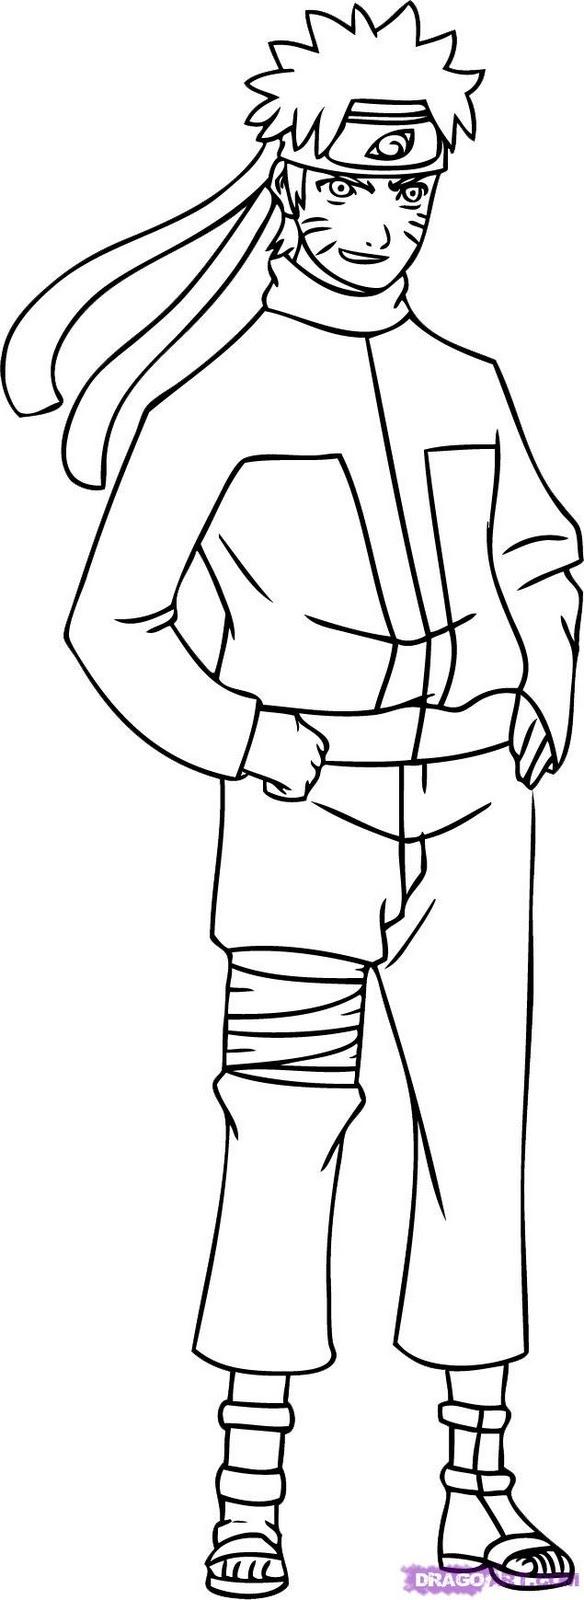 Coloriage Naruto Shippuden Imprimer Dessin Mangas Naruto further Coloriage Dorra additionally Lebron James Coloring Pages additionally Mario And Luigi Coloring Pages further Rattata. on naruto shippuden math